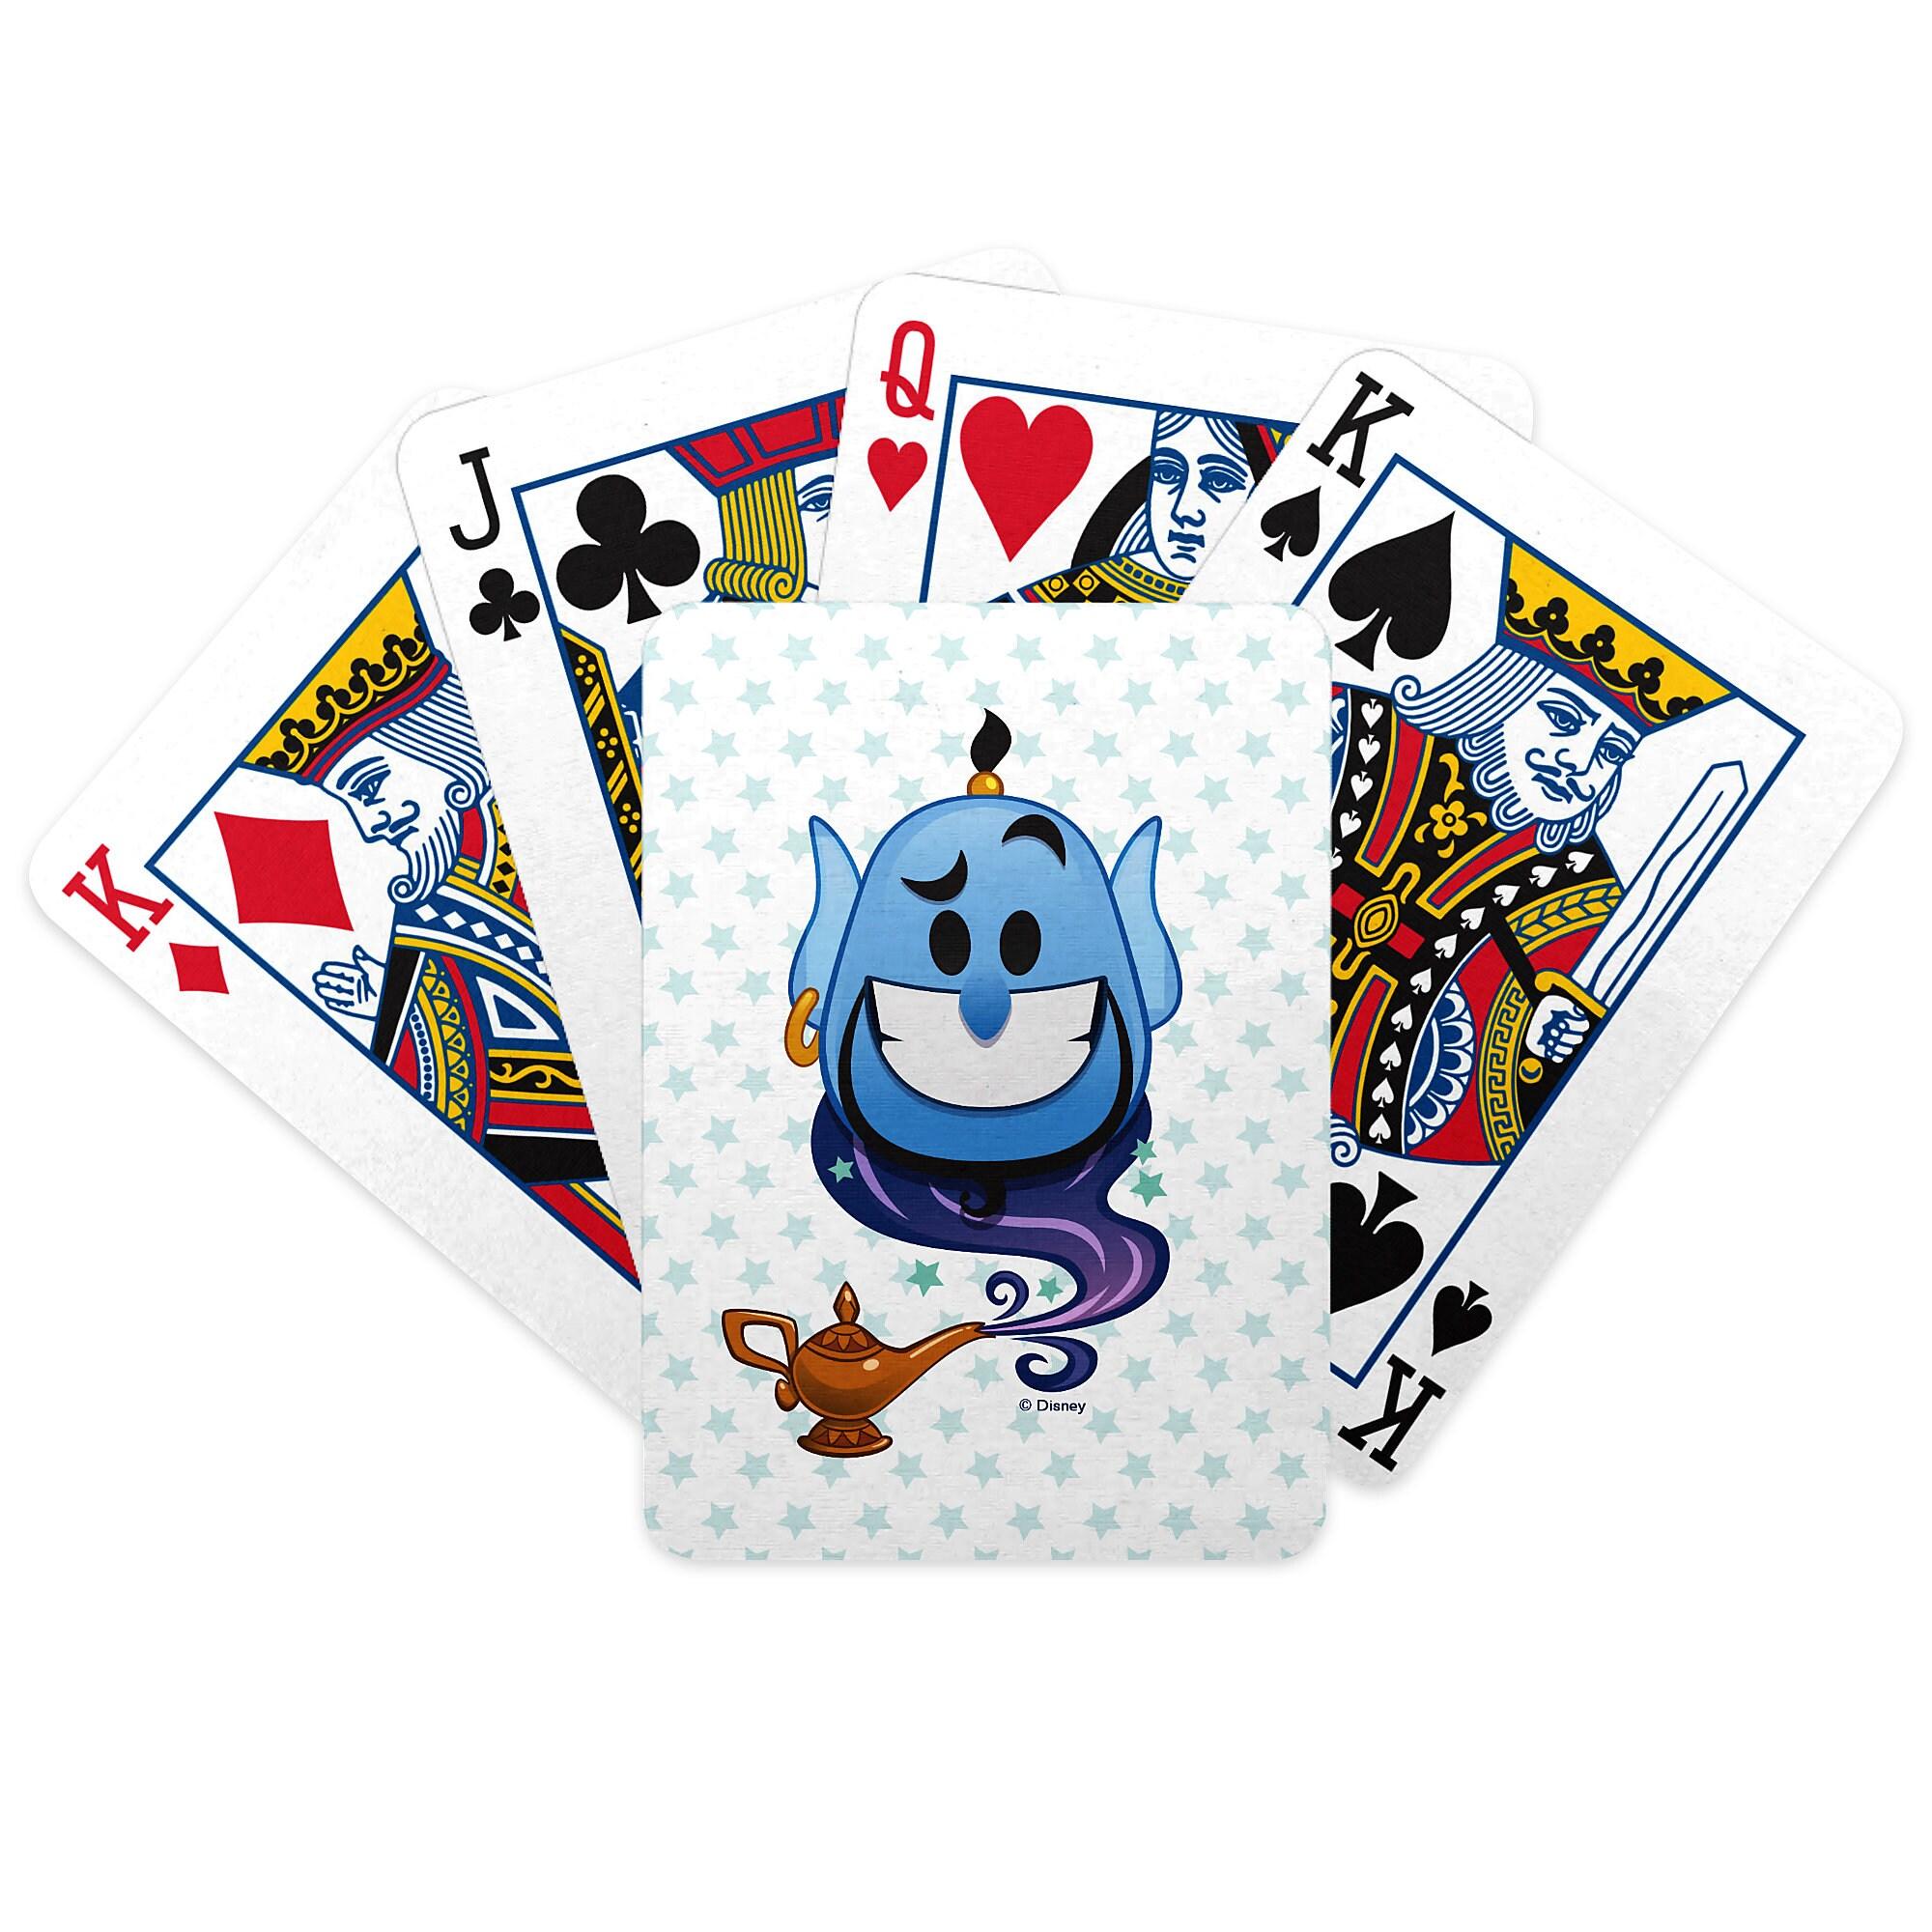 Genie Emoji Playing Cards - Aladdin - Customizable